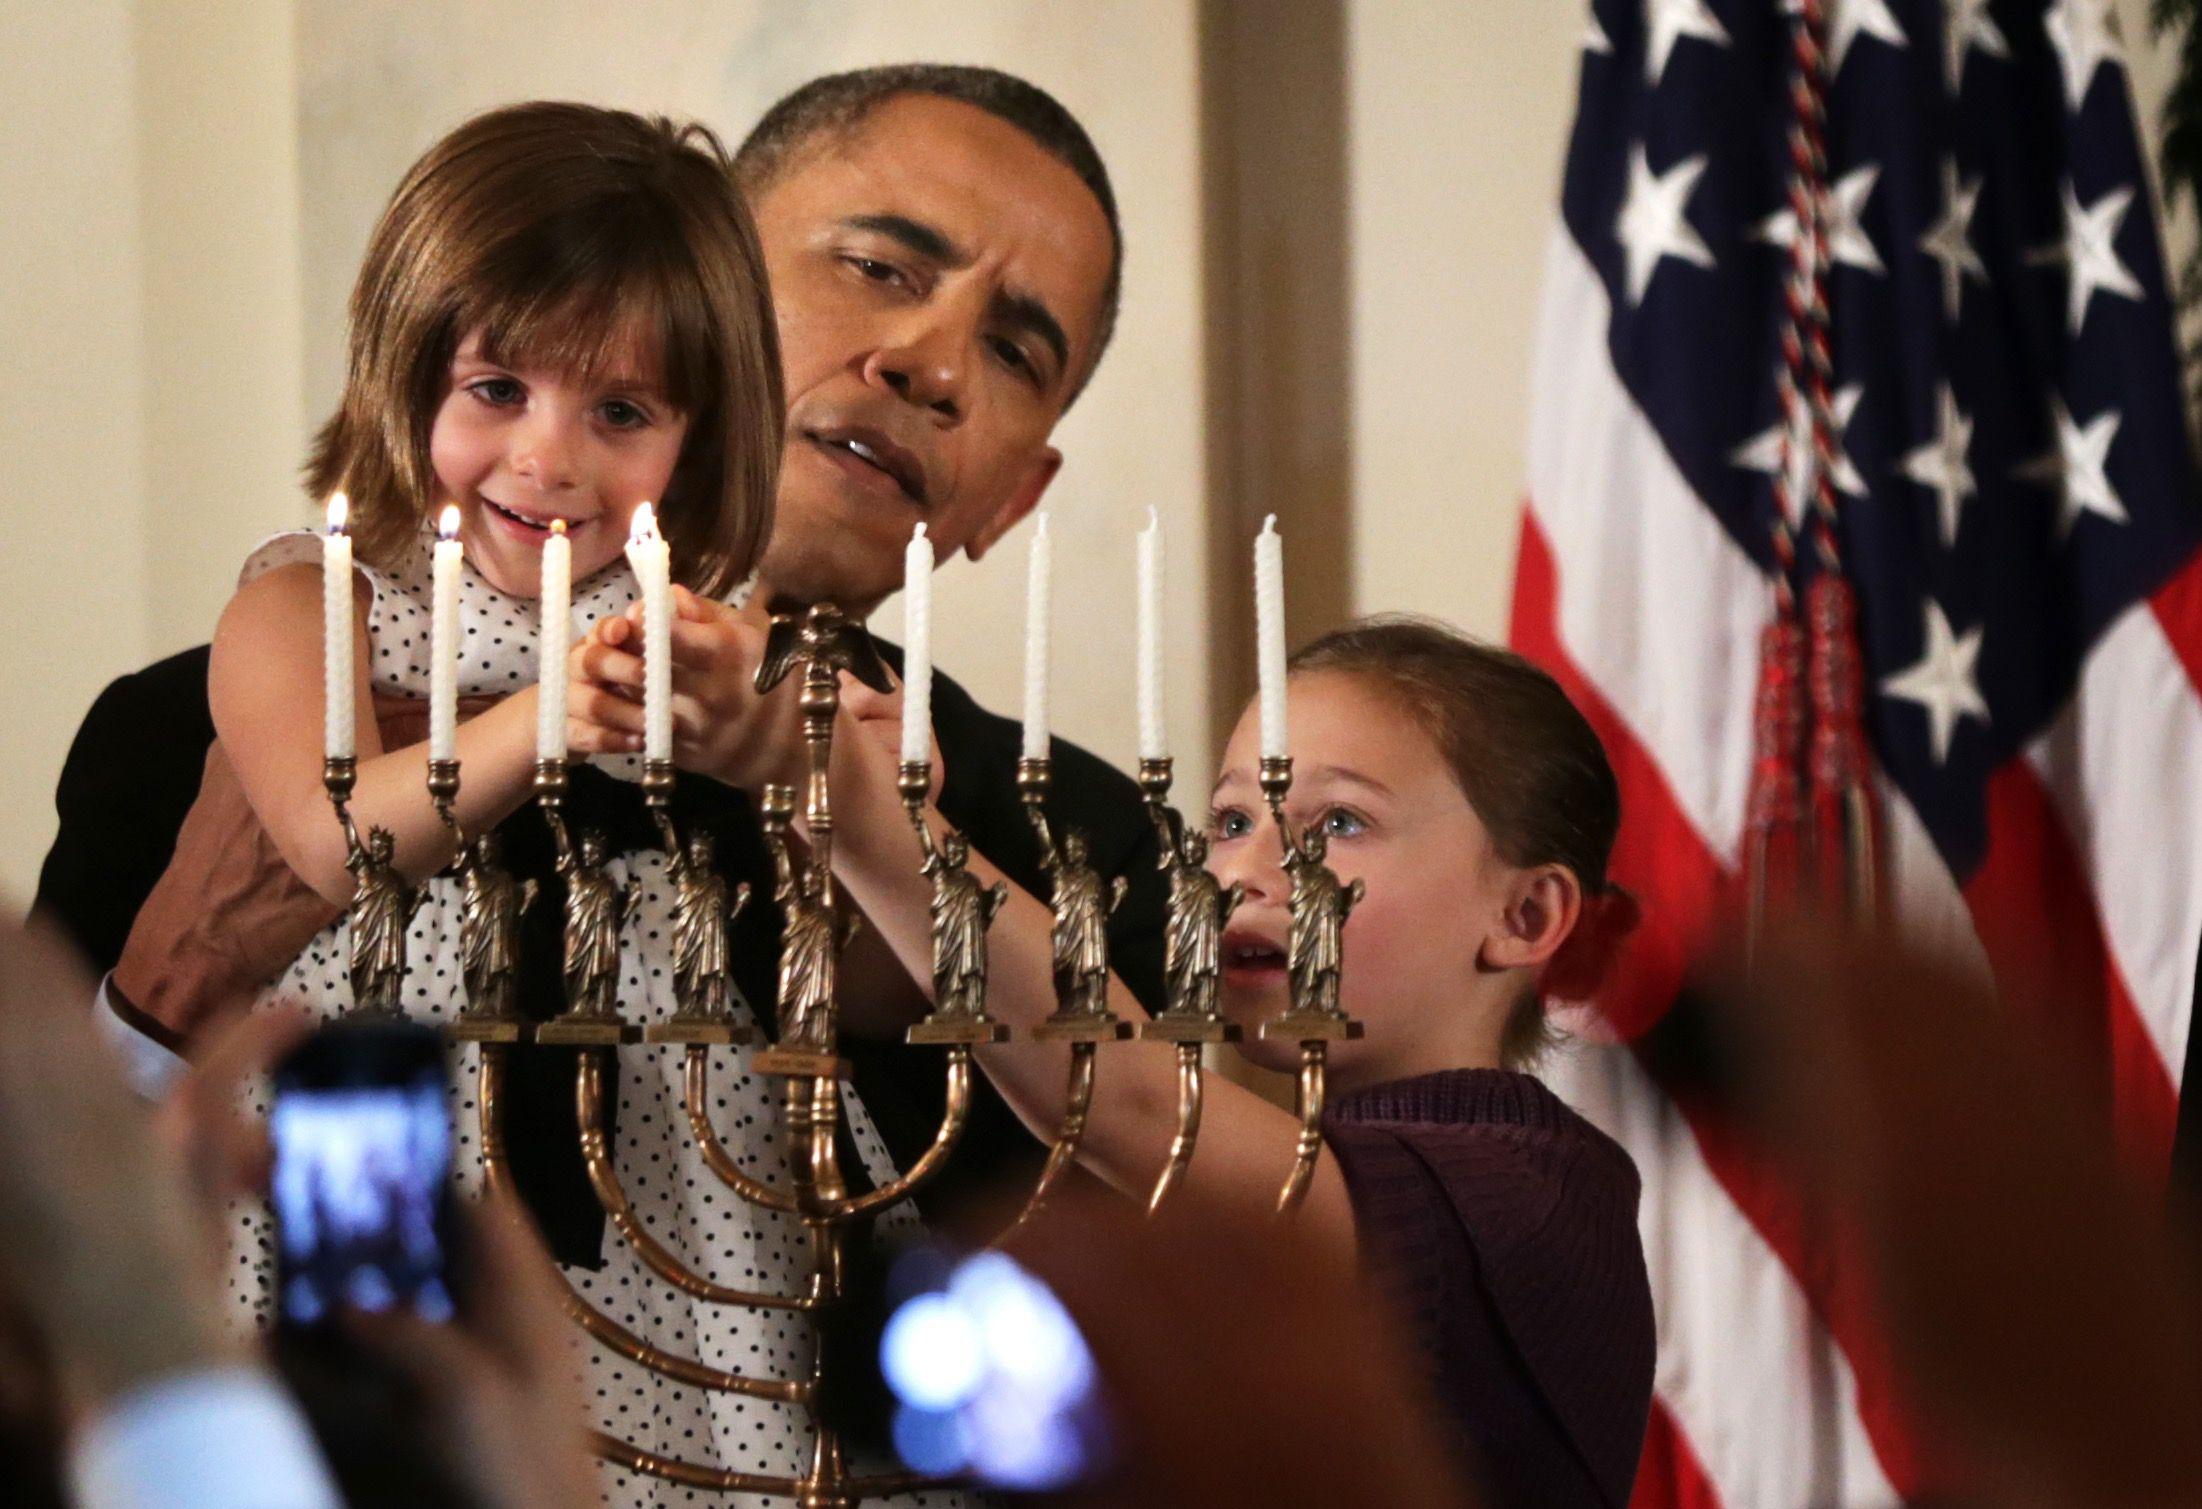 President Obama Lights The Menorah During The White Houseu0027s 2014 Hanukkah  Celebration.